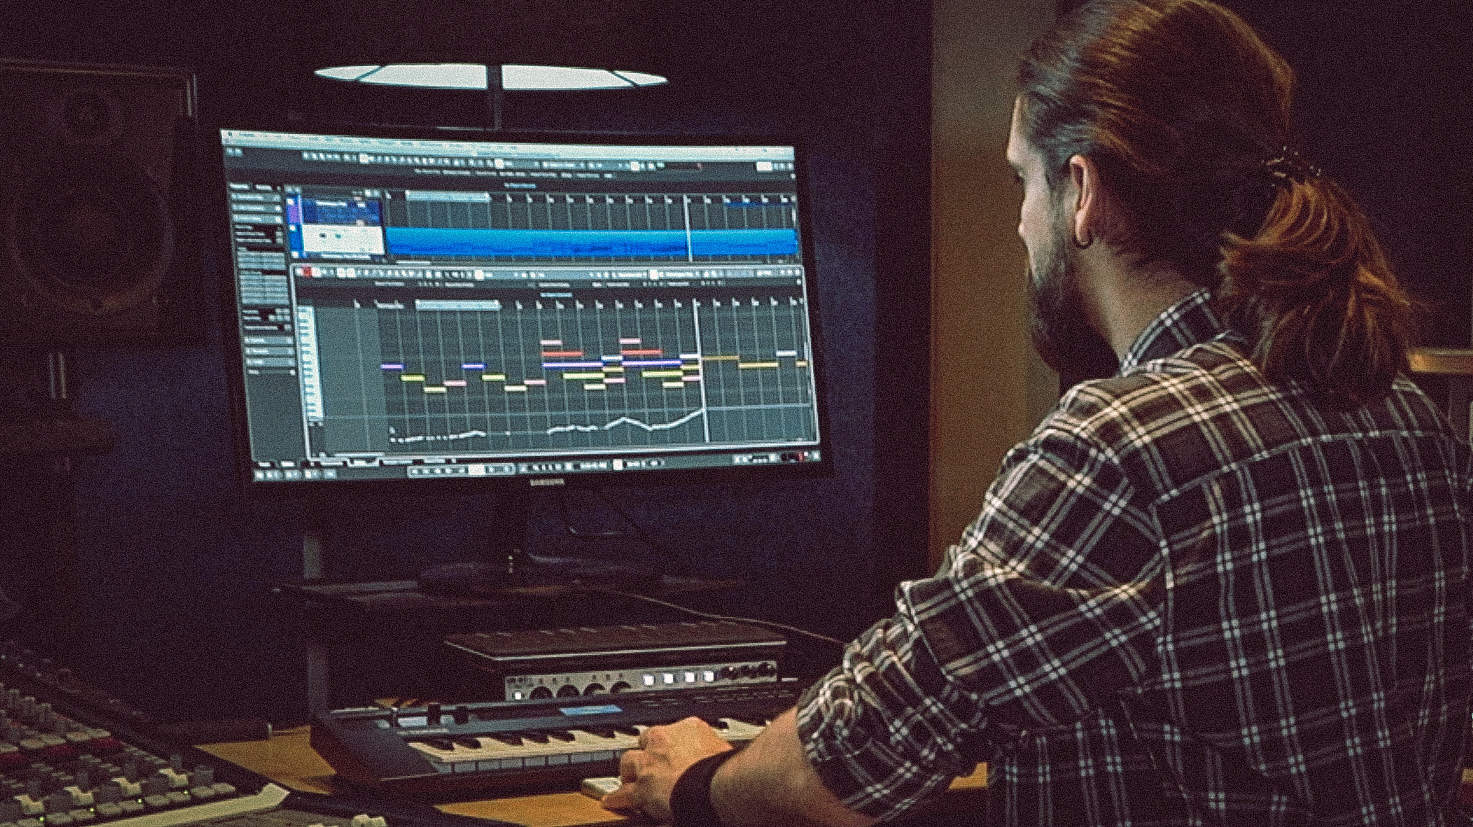 download cubase music recording software